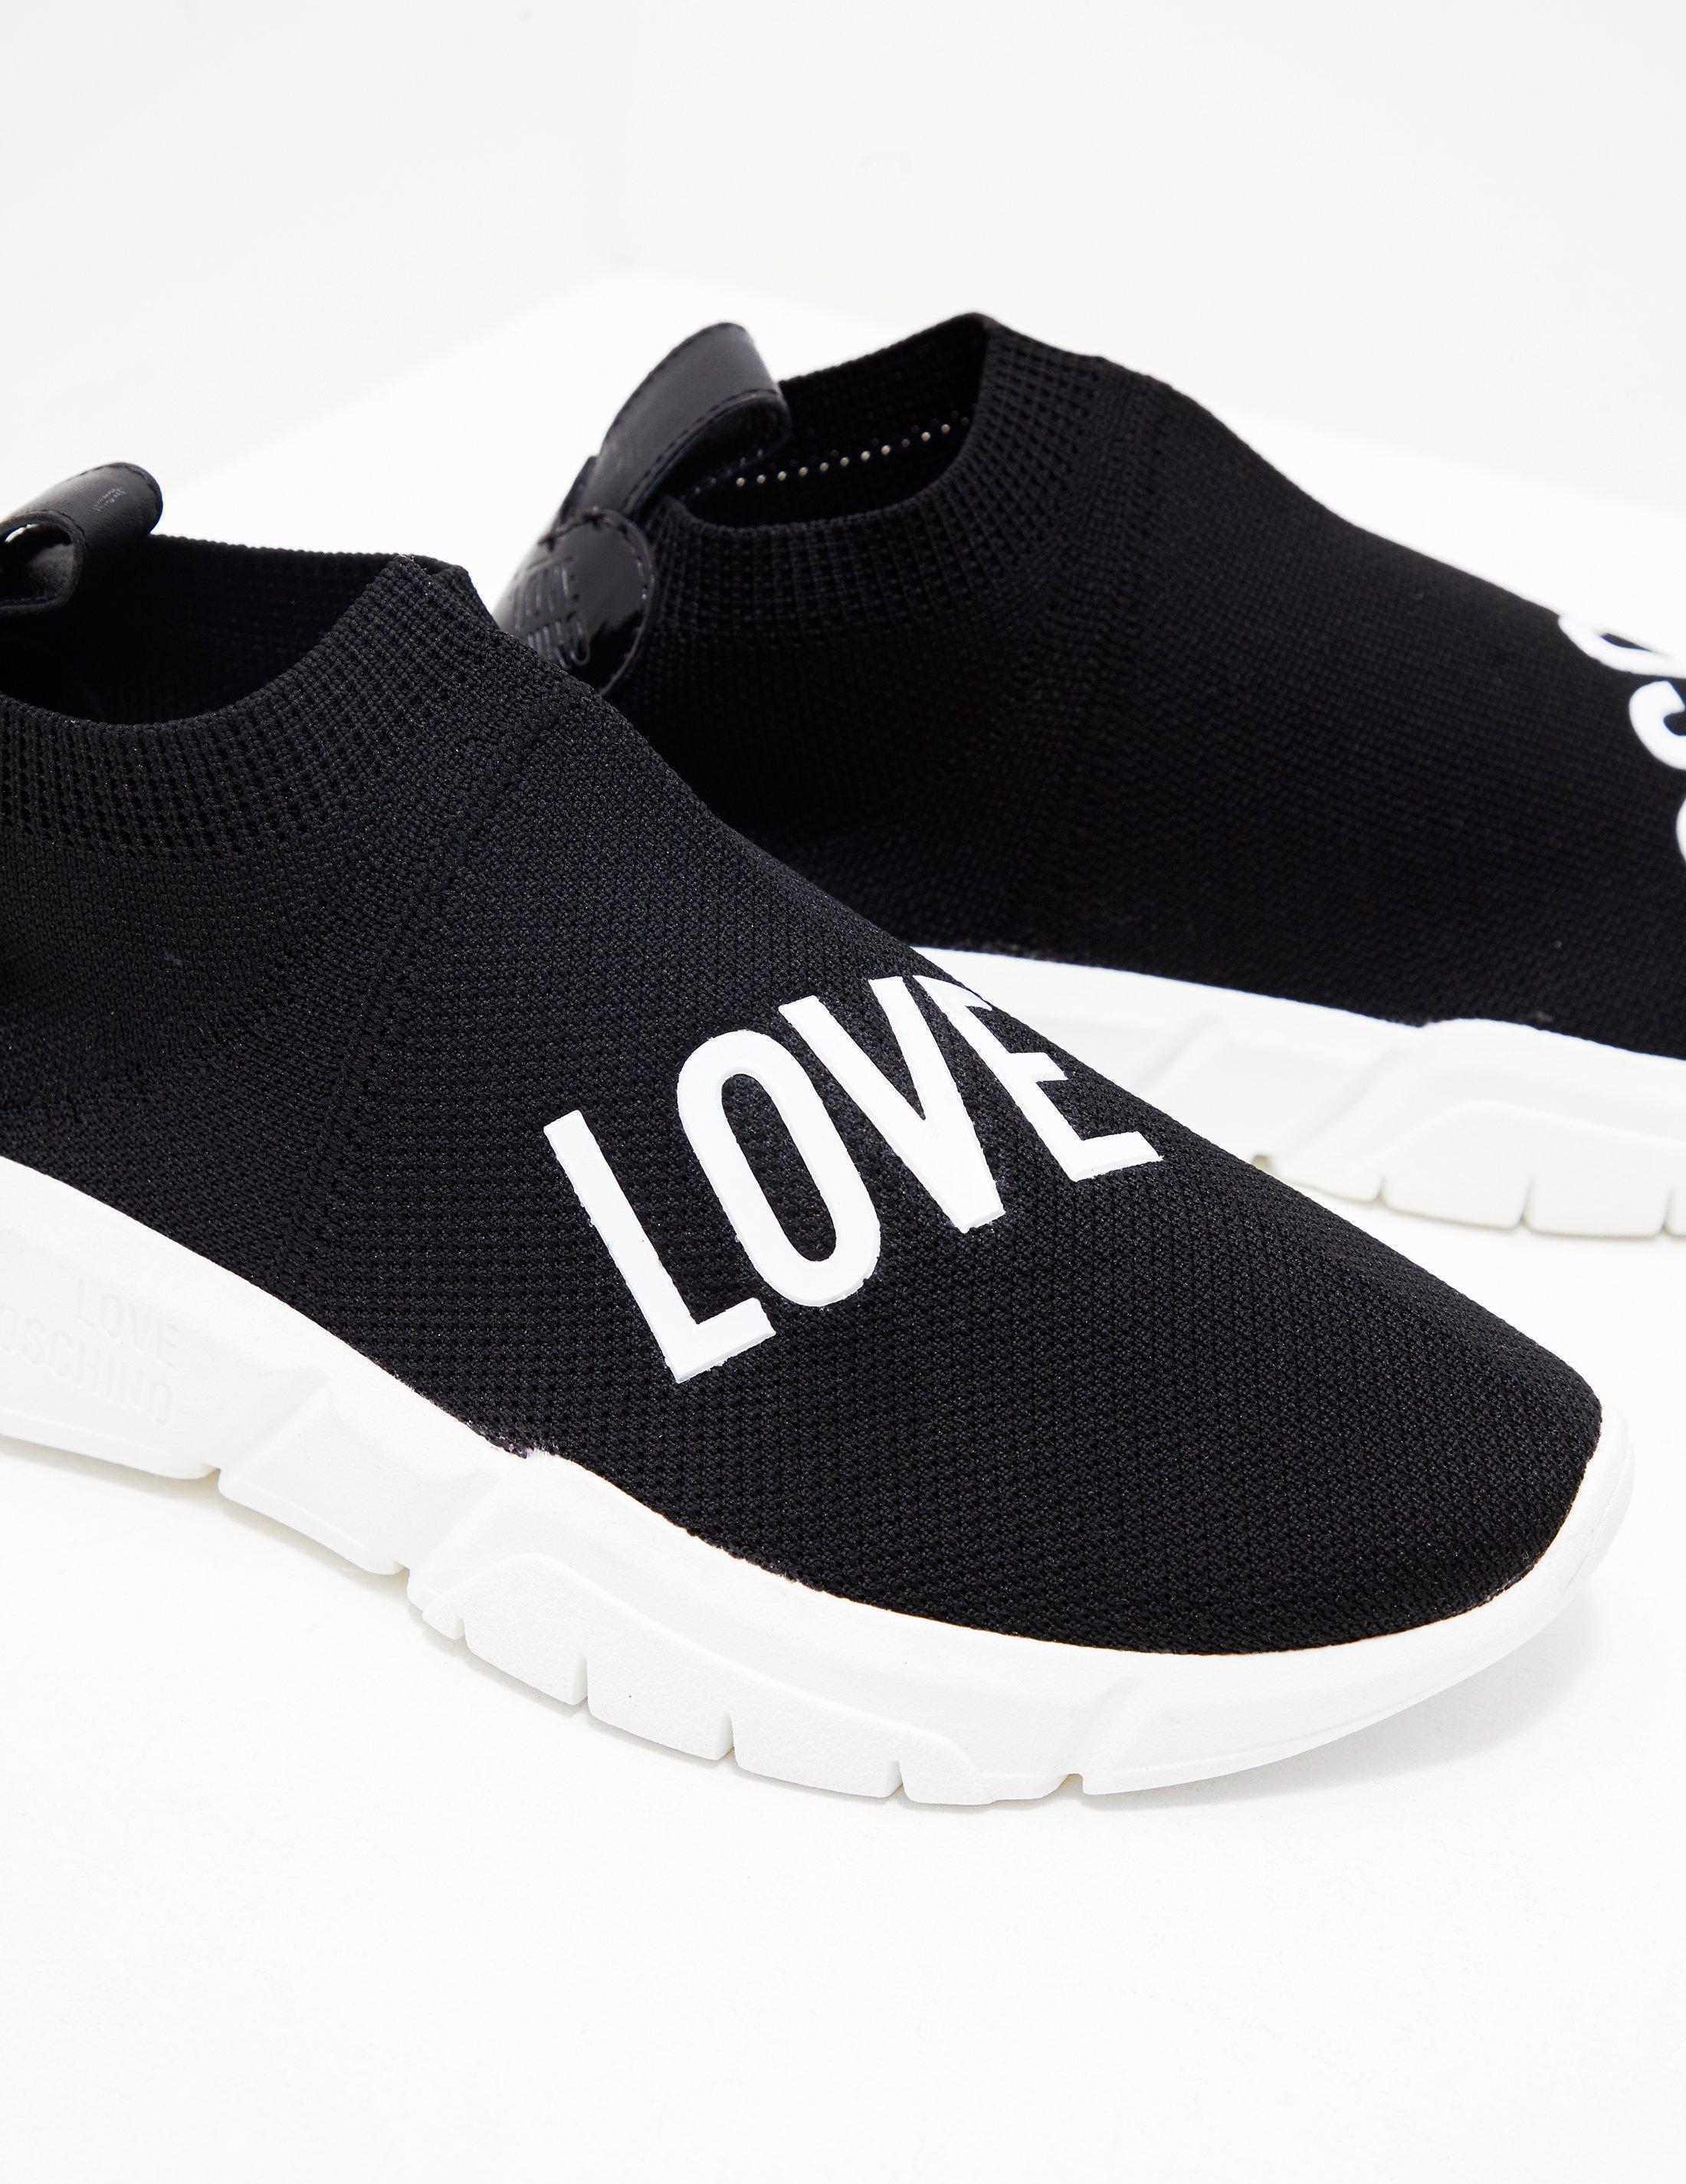 d6fce5f98b86c Love Moschino Womens Logo Sock Trainer Black